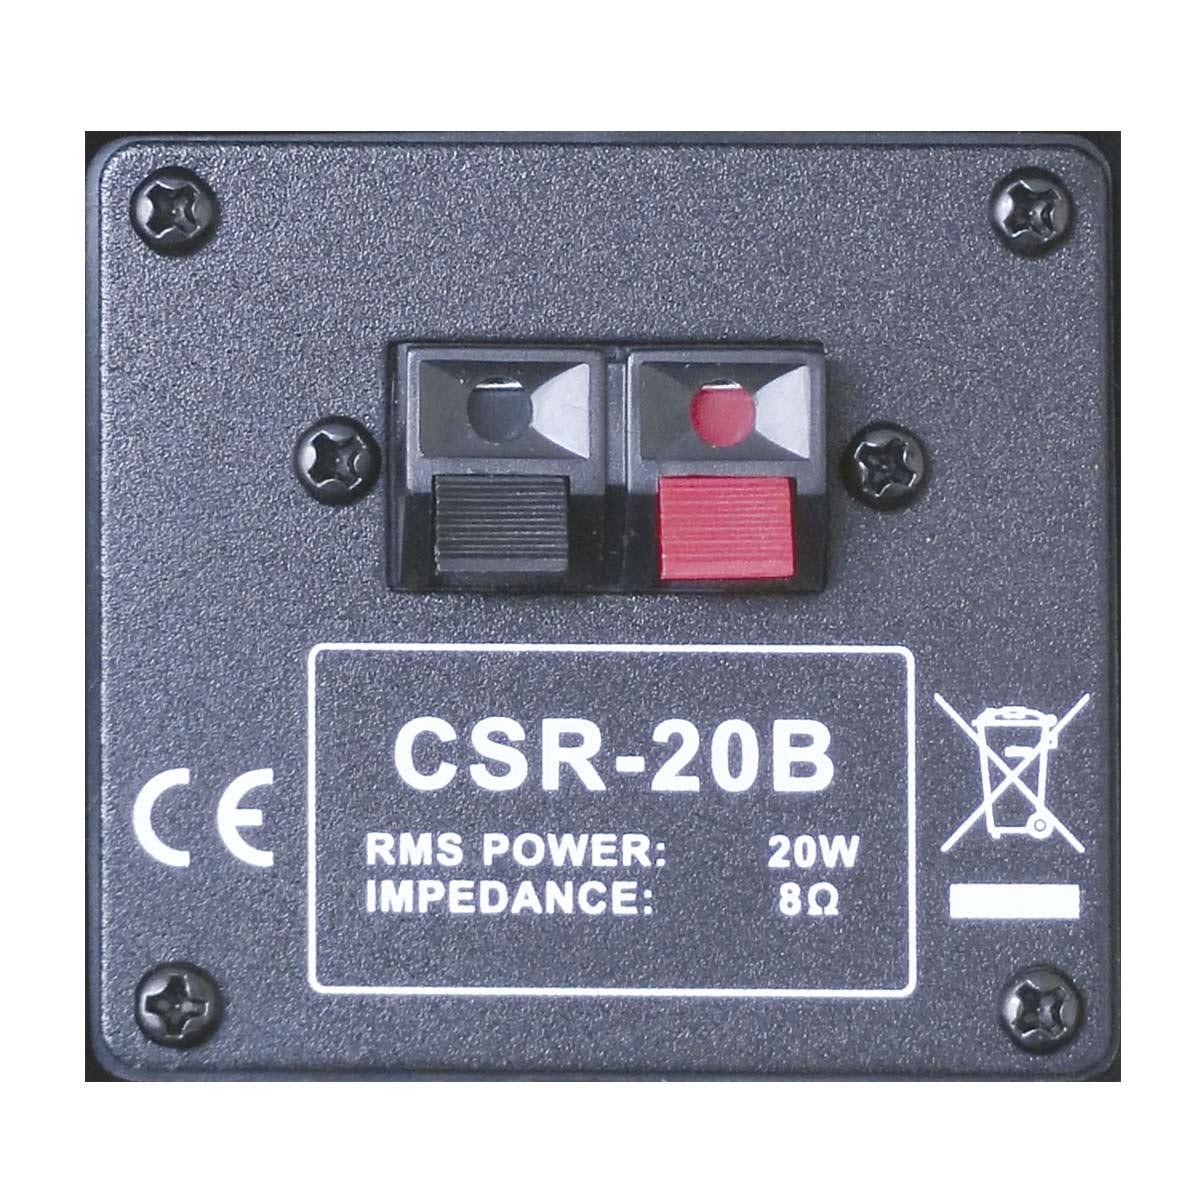 CSR20B - Caixa Passiva 20W Preta c/ Suporte ( Par ) CSR 20 B - CSR